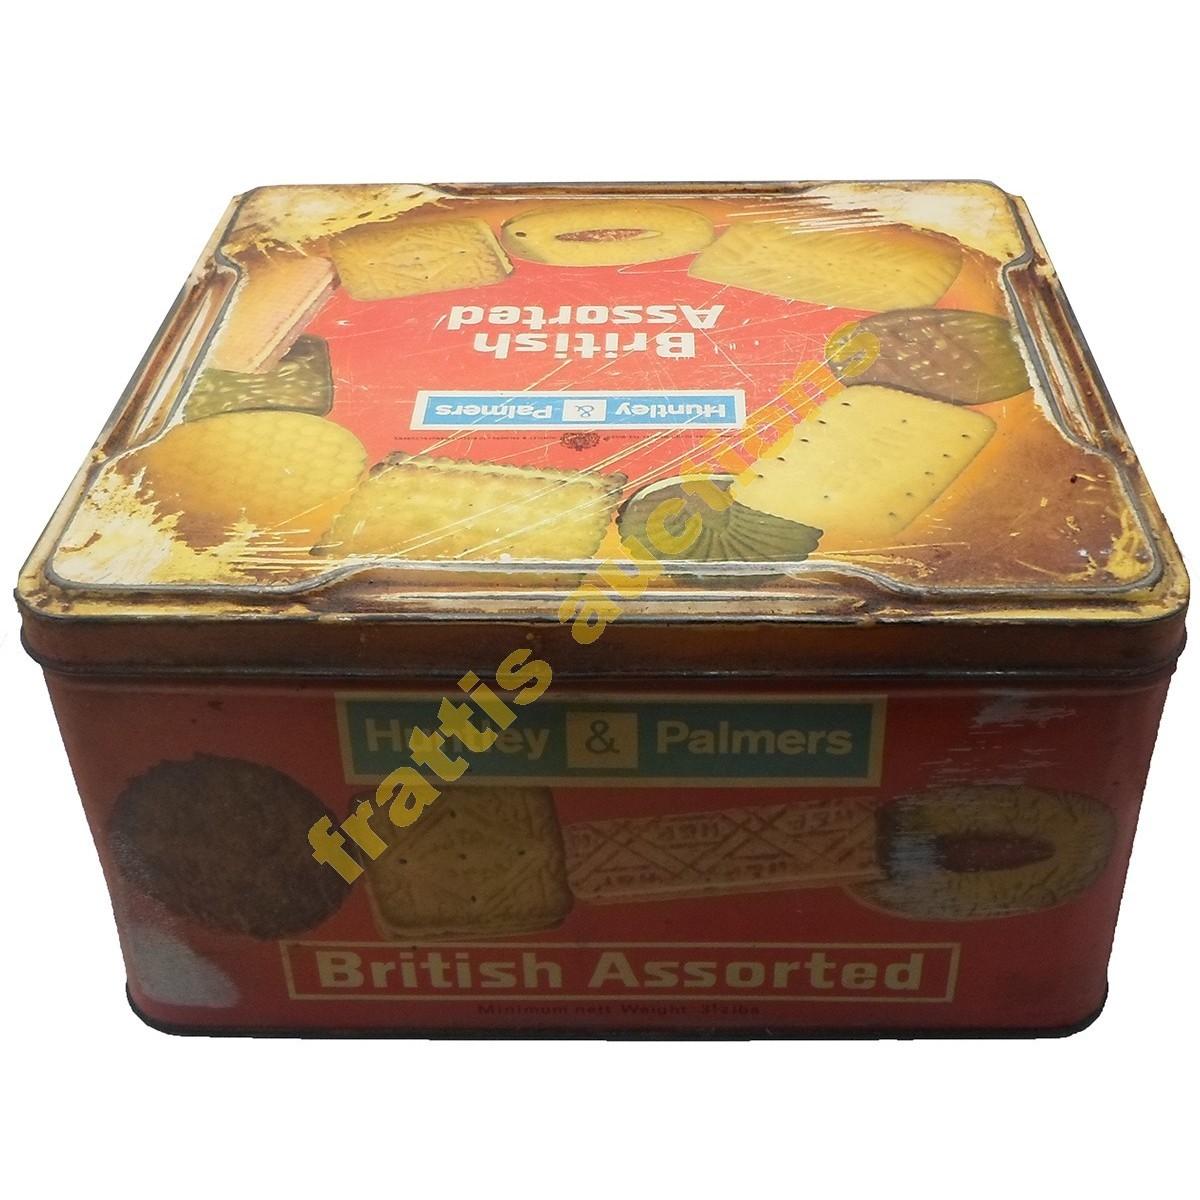 Huntley & Palmers, μεταλλικό κουτί.